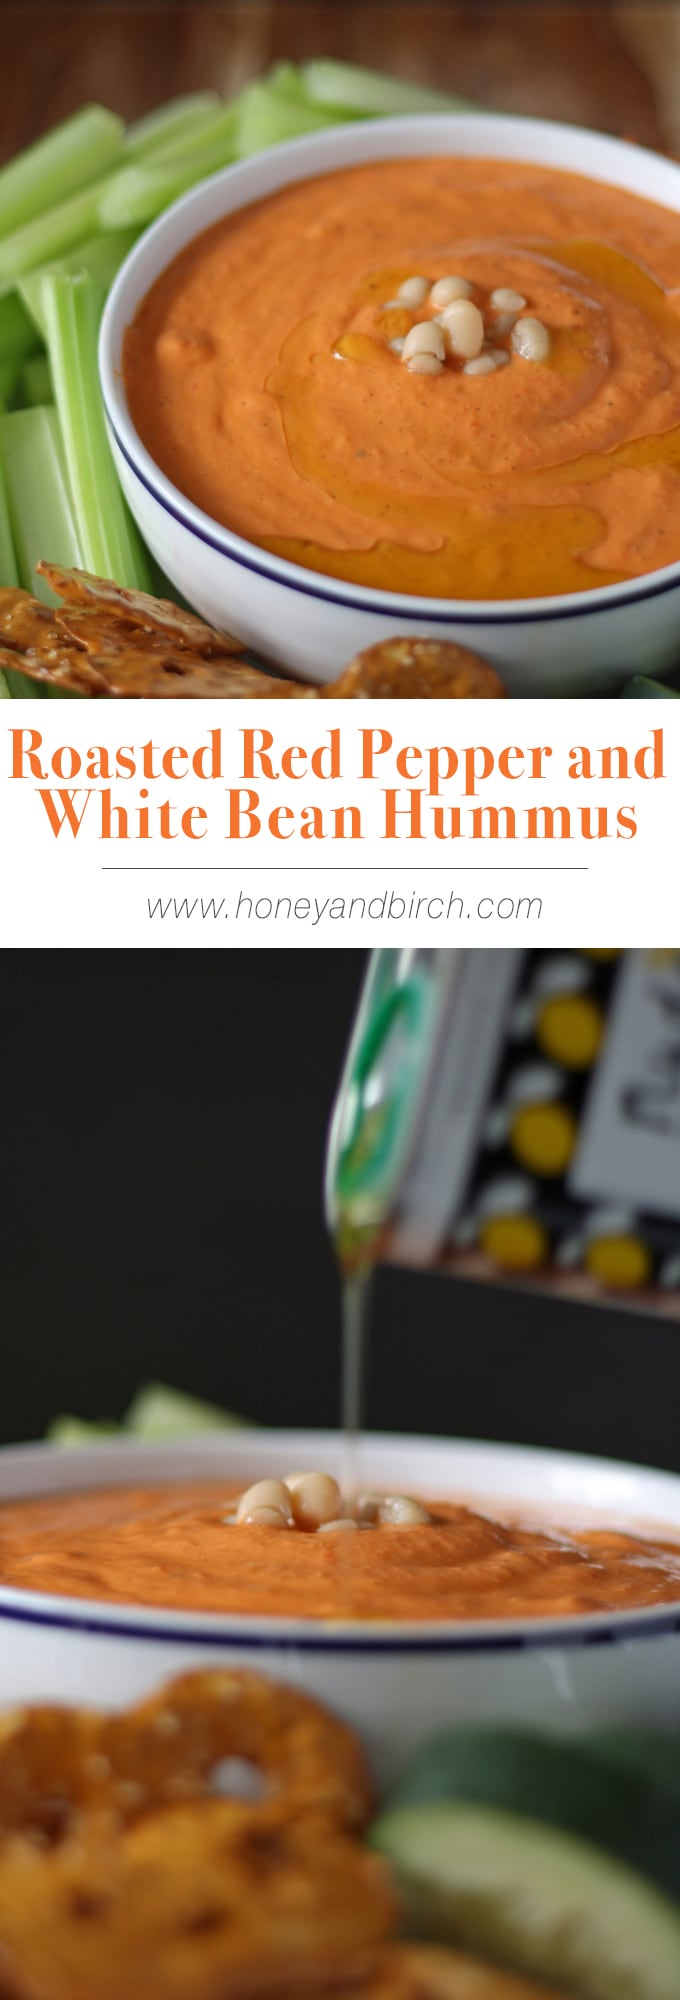 Roasted Red Pepper and White Bean Hummus | www.honeyandbirch.com | #dip